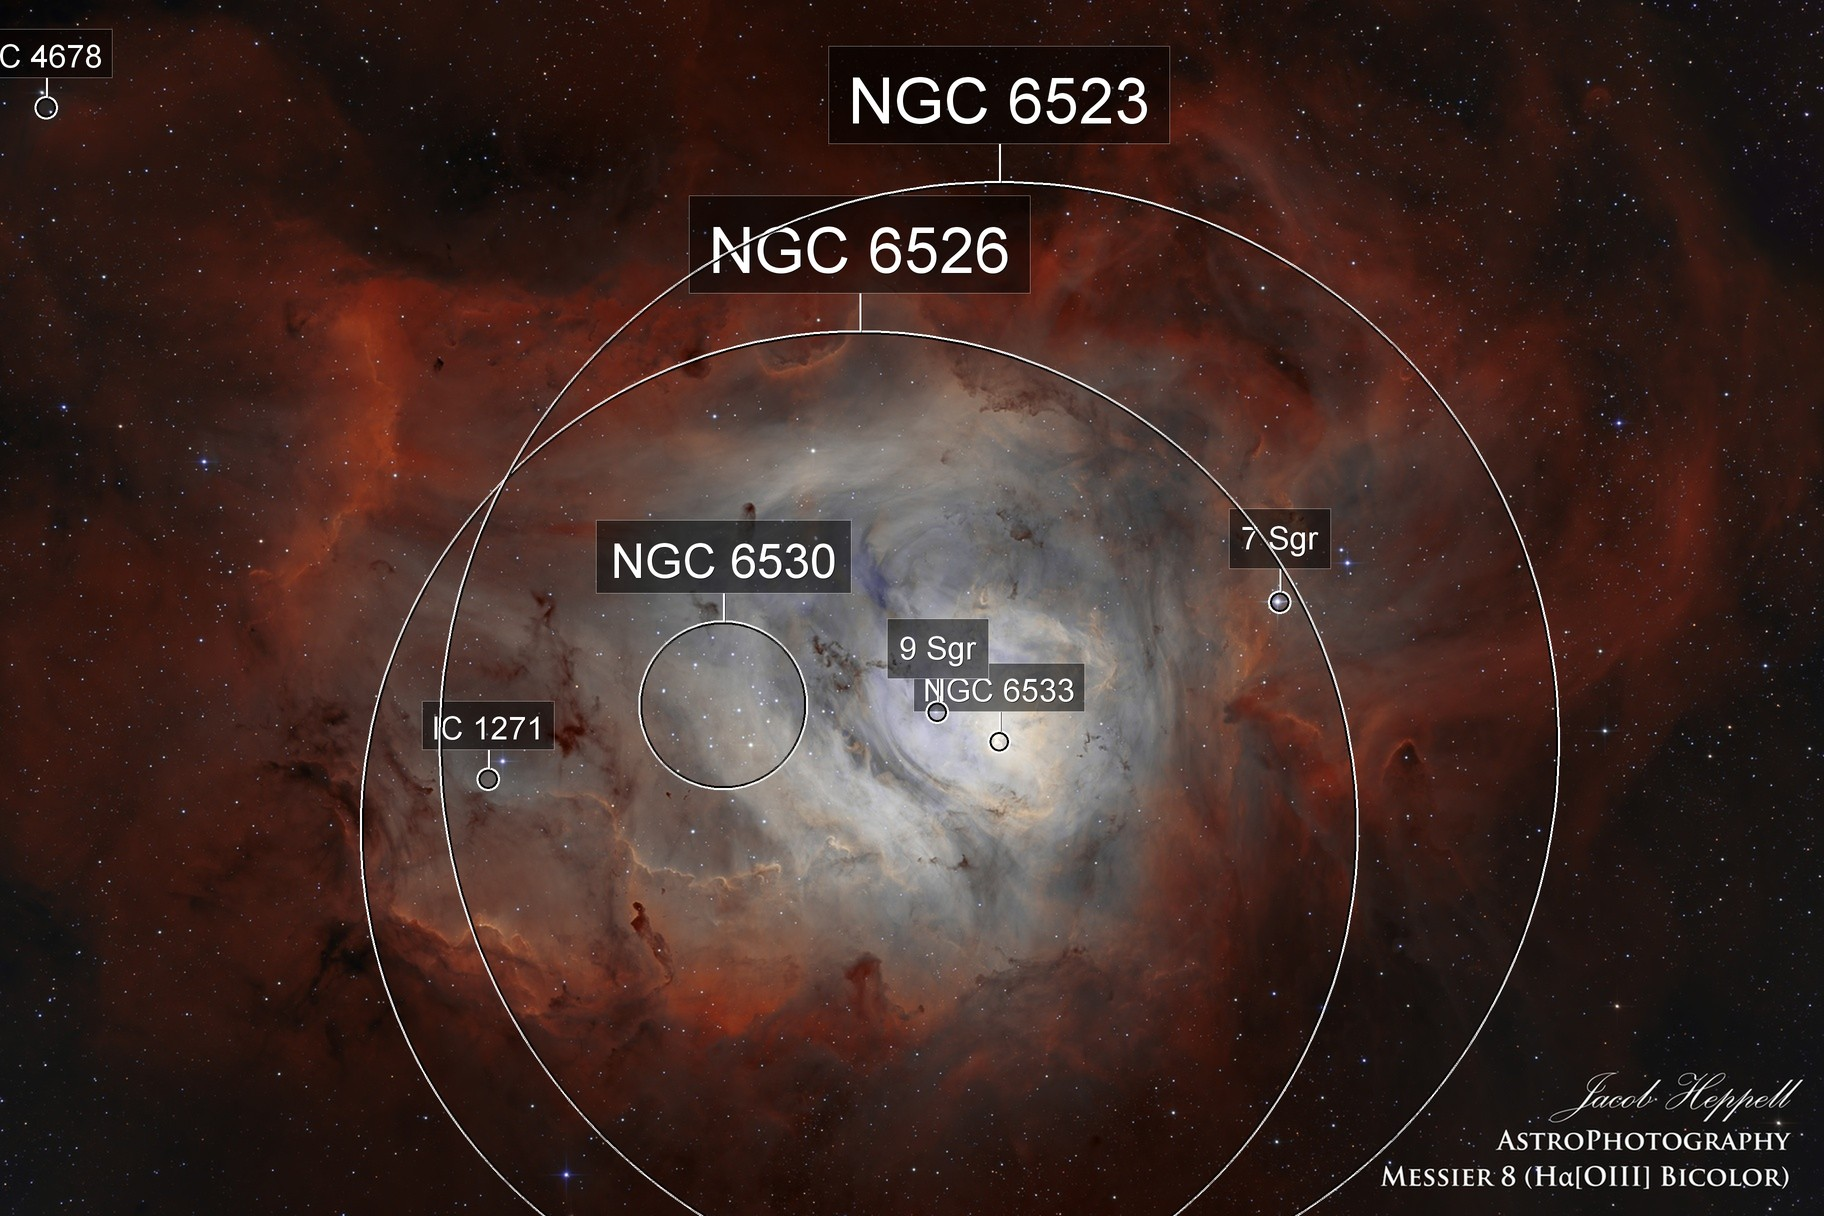 Messier 8 (Lagoon Nebula) in Ha[OIII] Bicolor